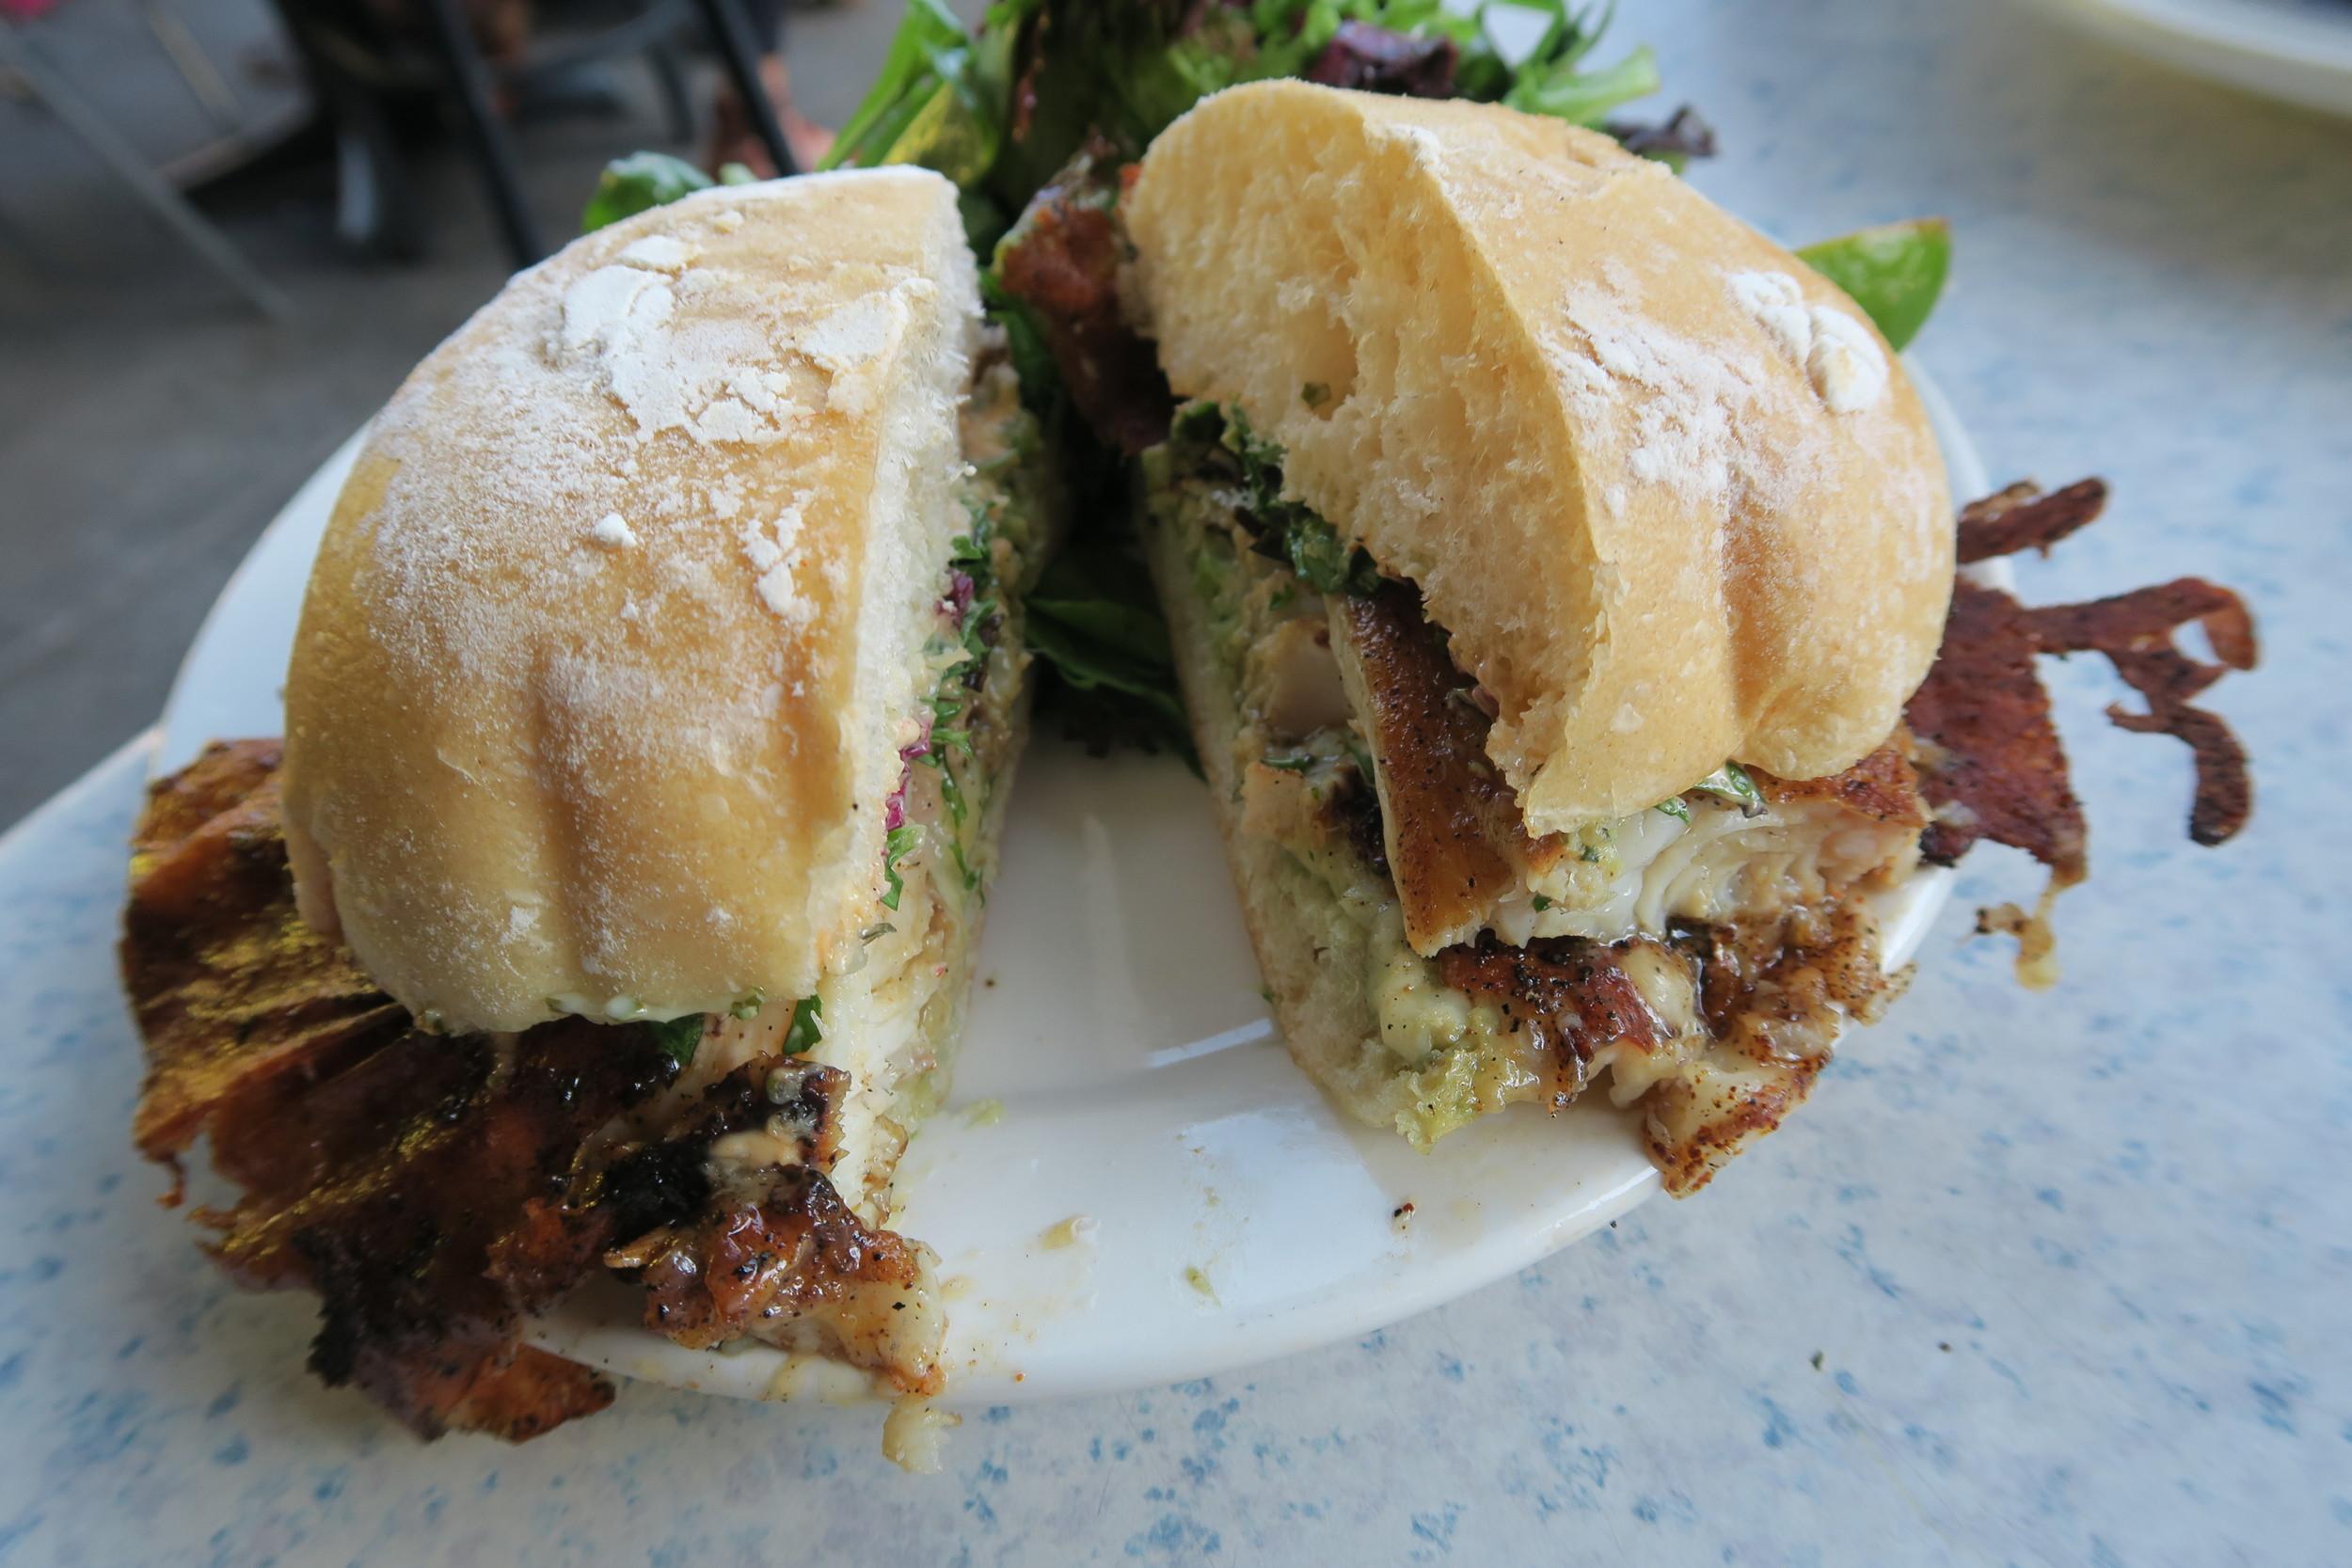 Chipotle Fish Sandwich: Seared Tilapia, Monterey Jack Cheese, Guacamole, Shredded Greens, Chipotle Aioli $12